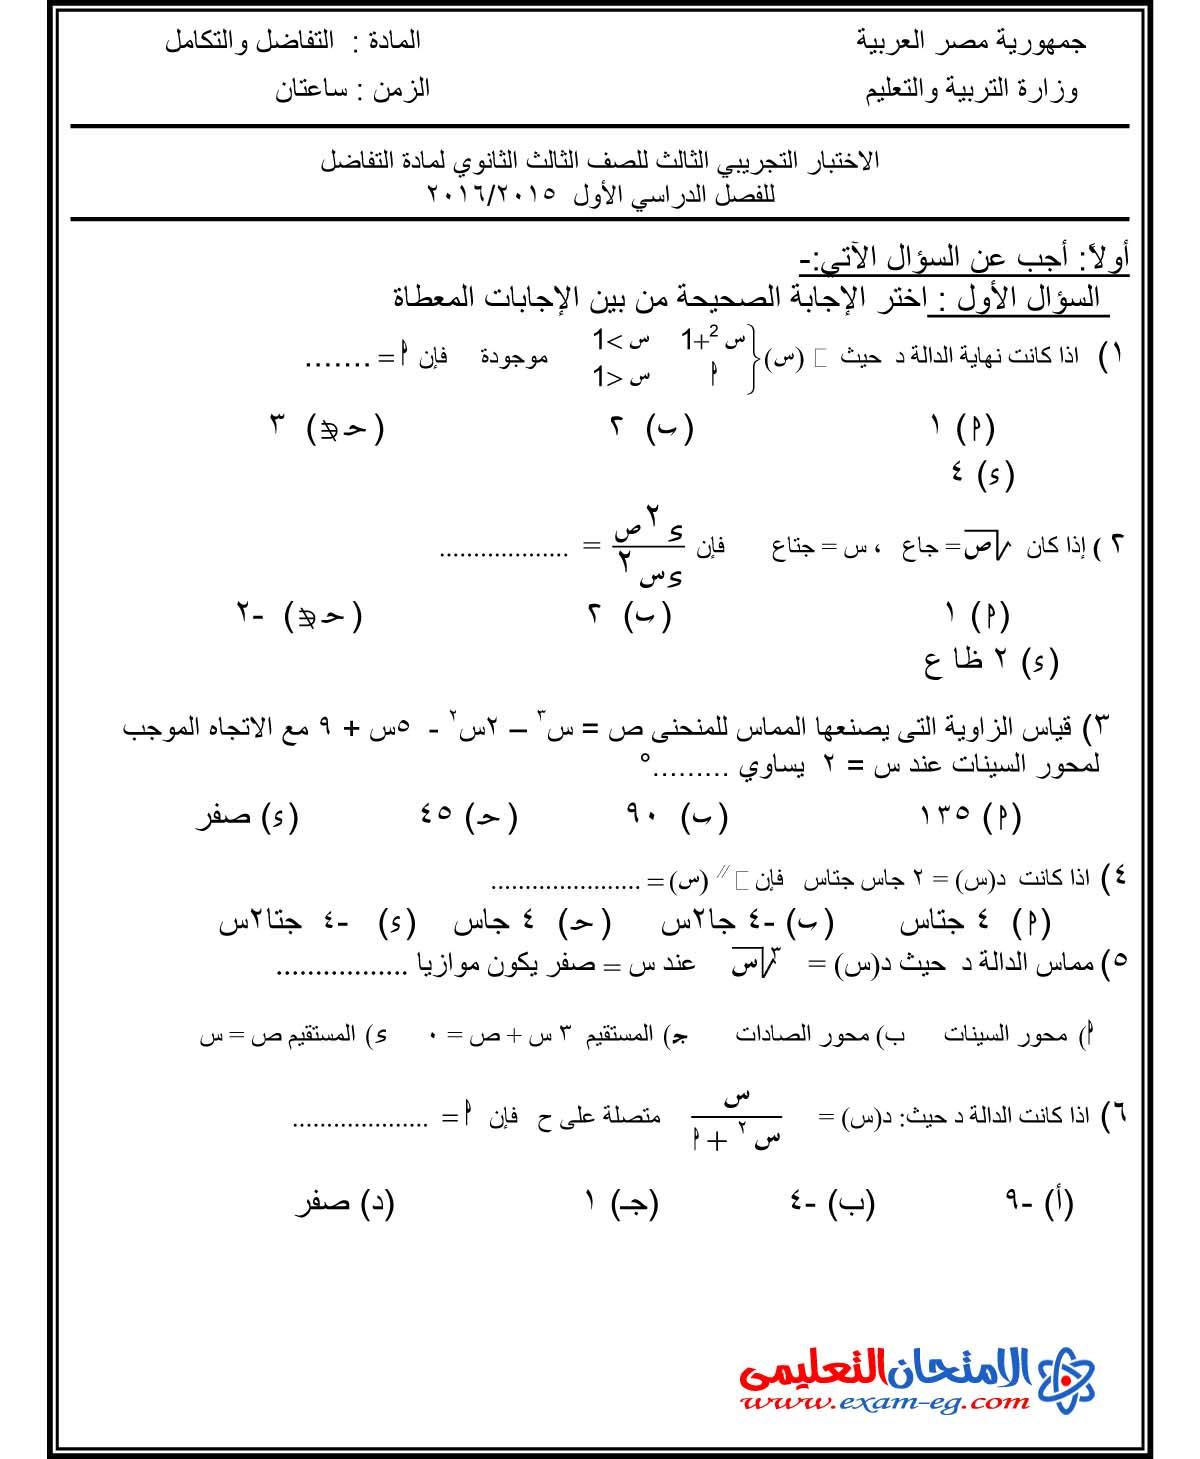 exam-eg.com_1460419970755.jpg